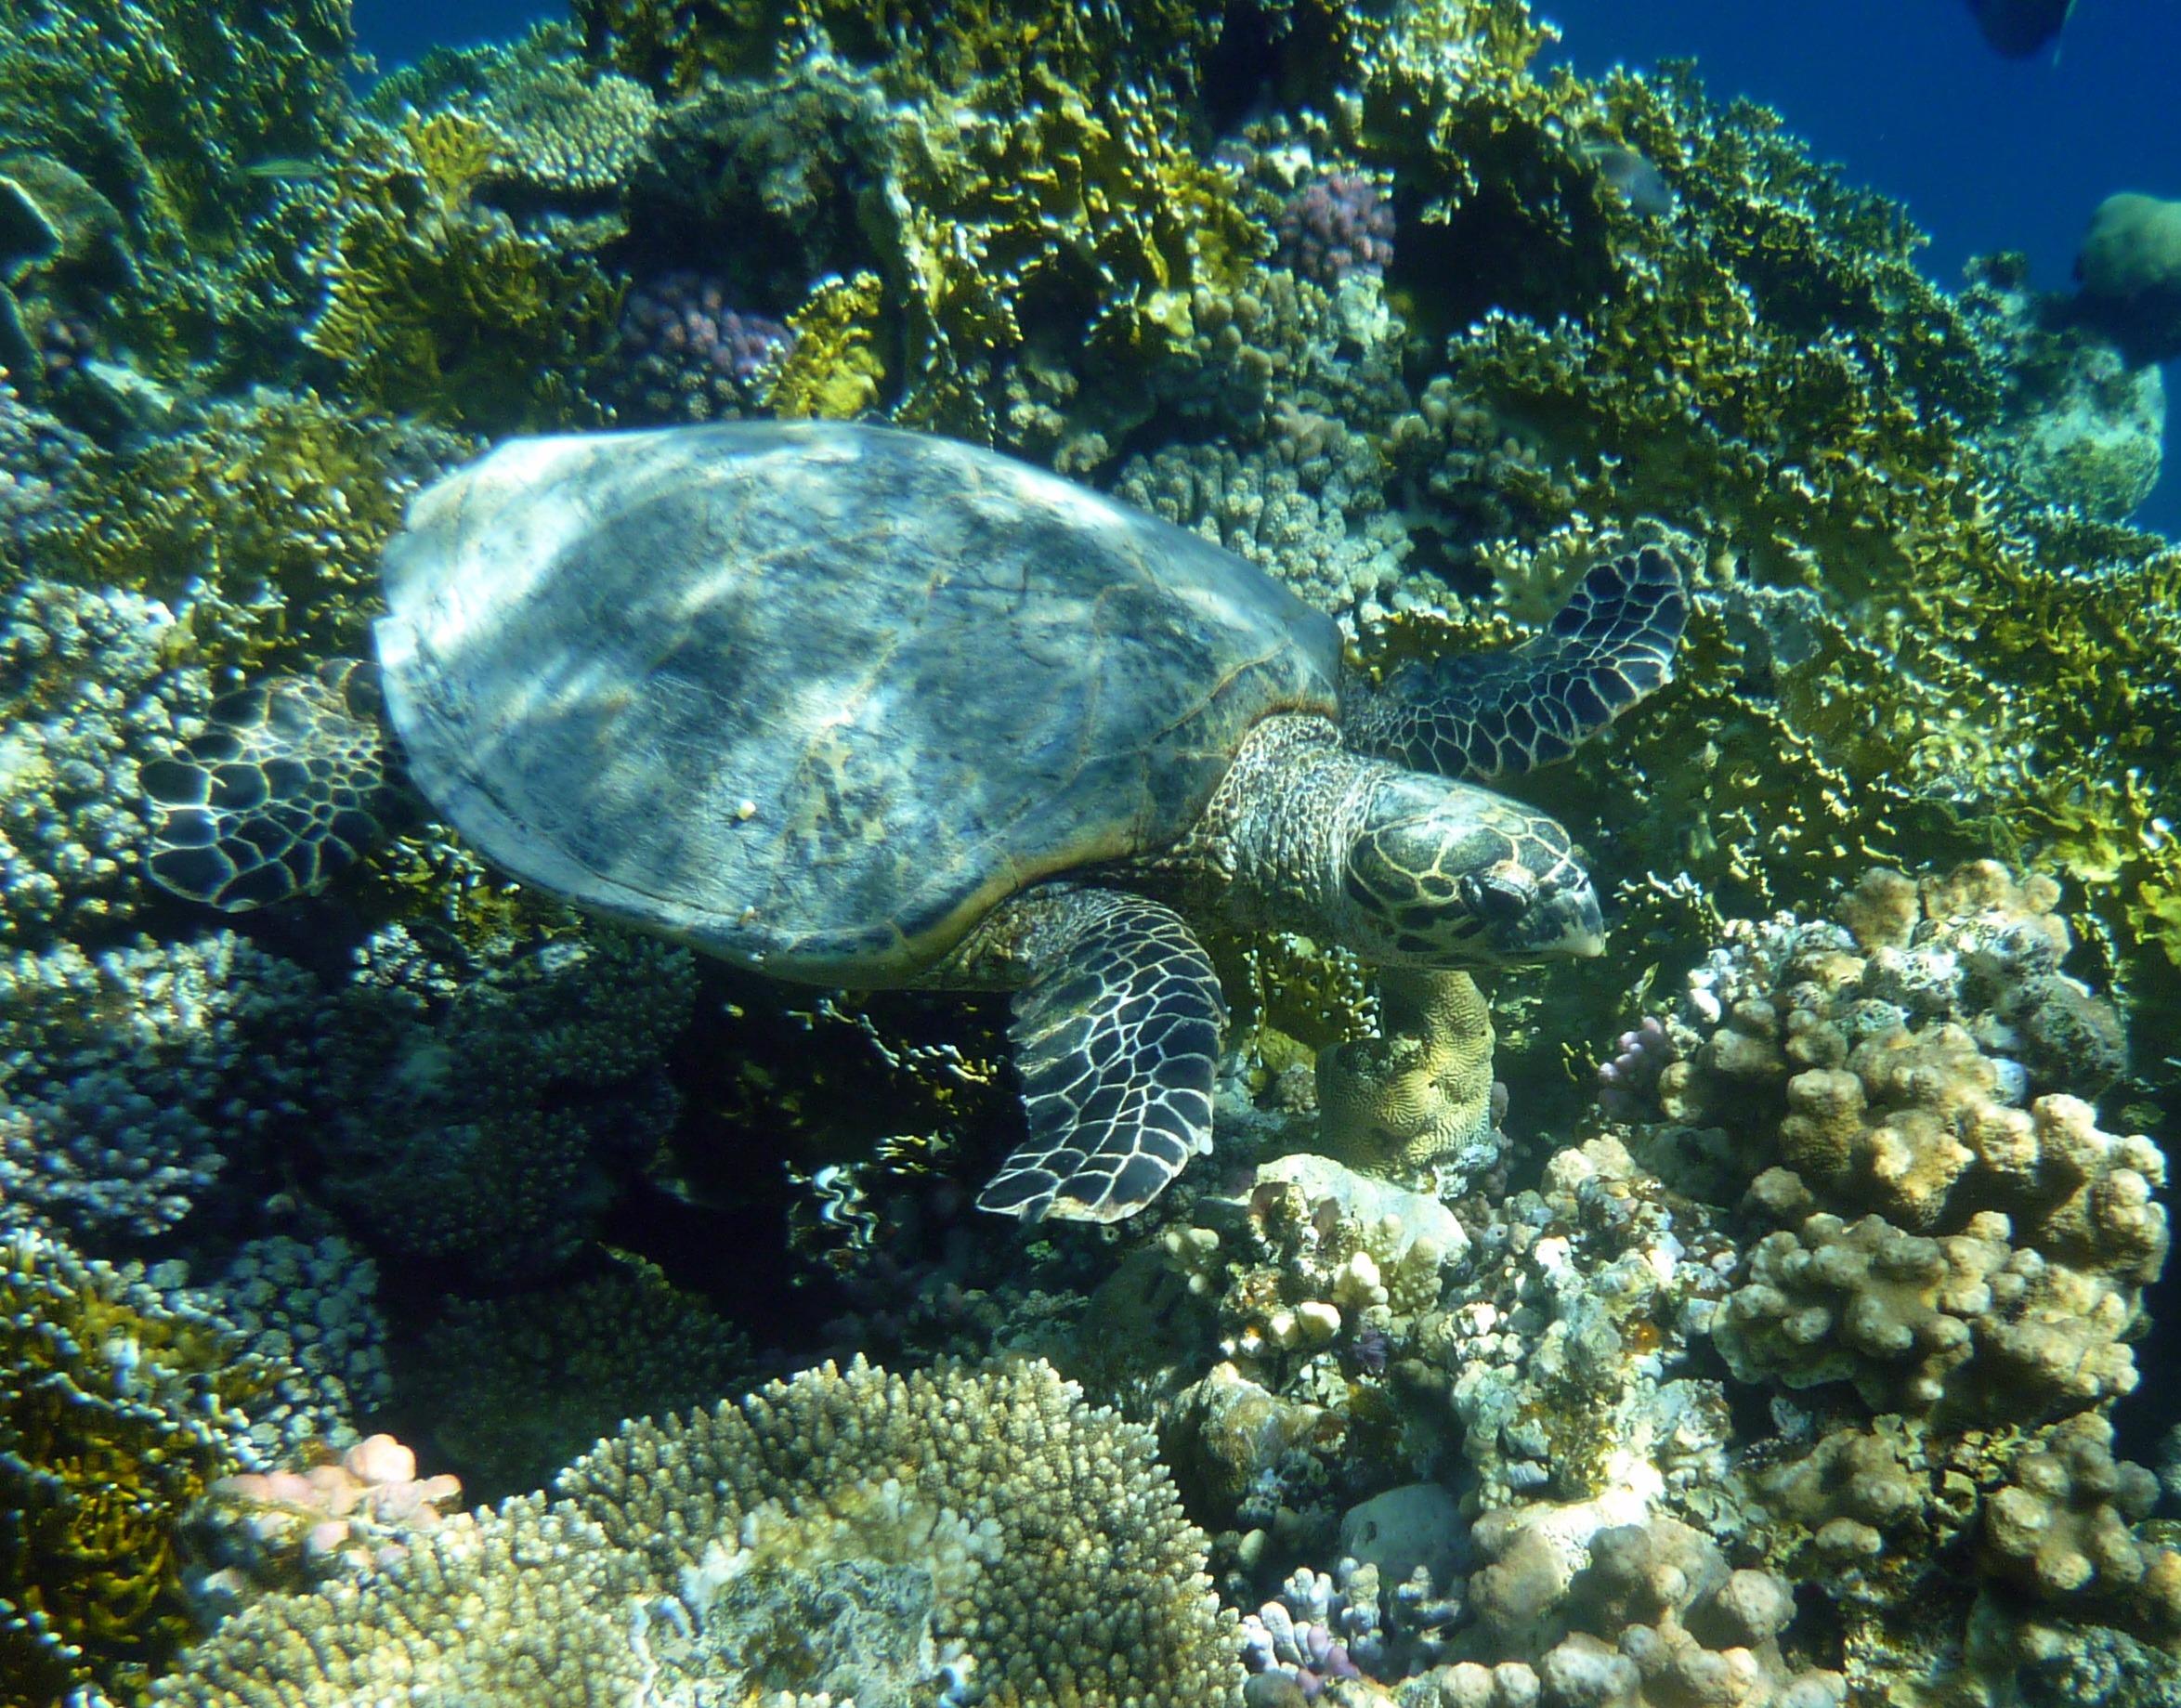 free images diving underwater sea turtle reptile fauna